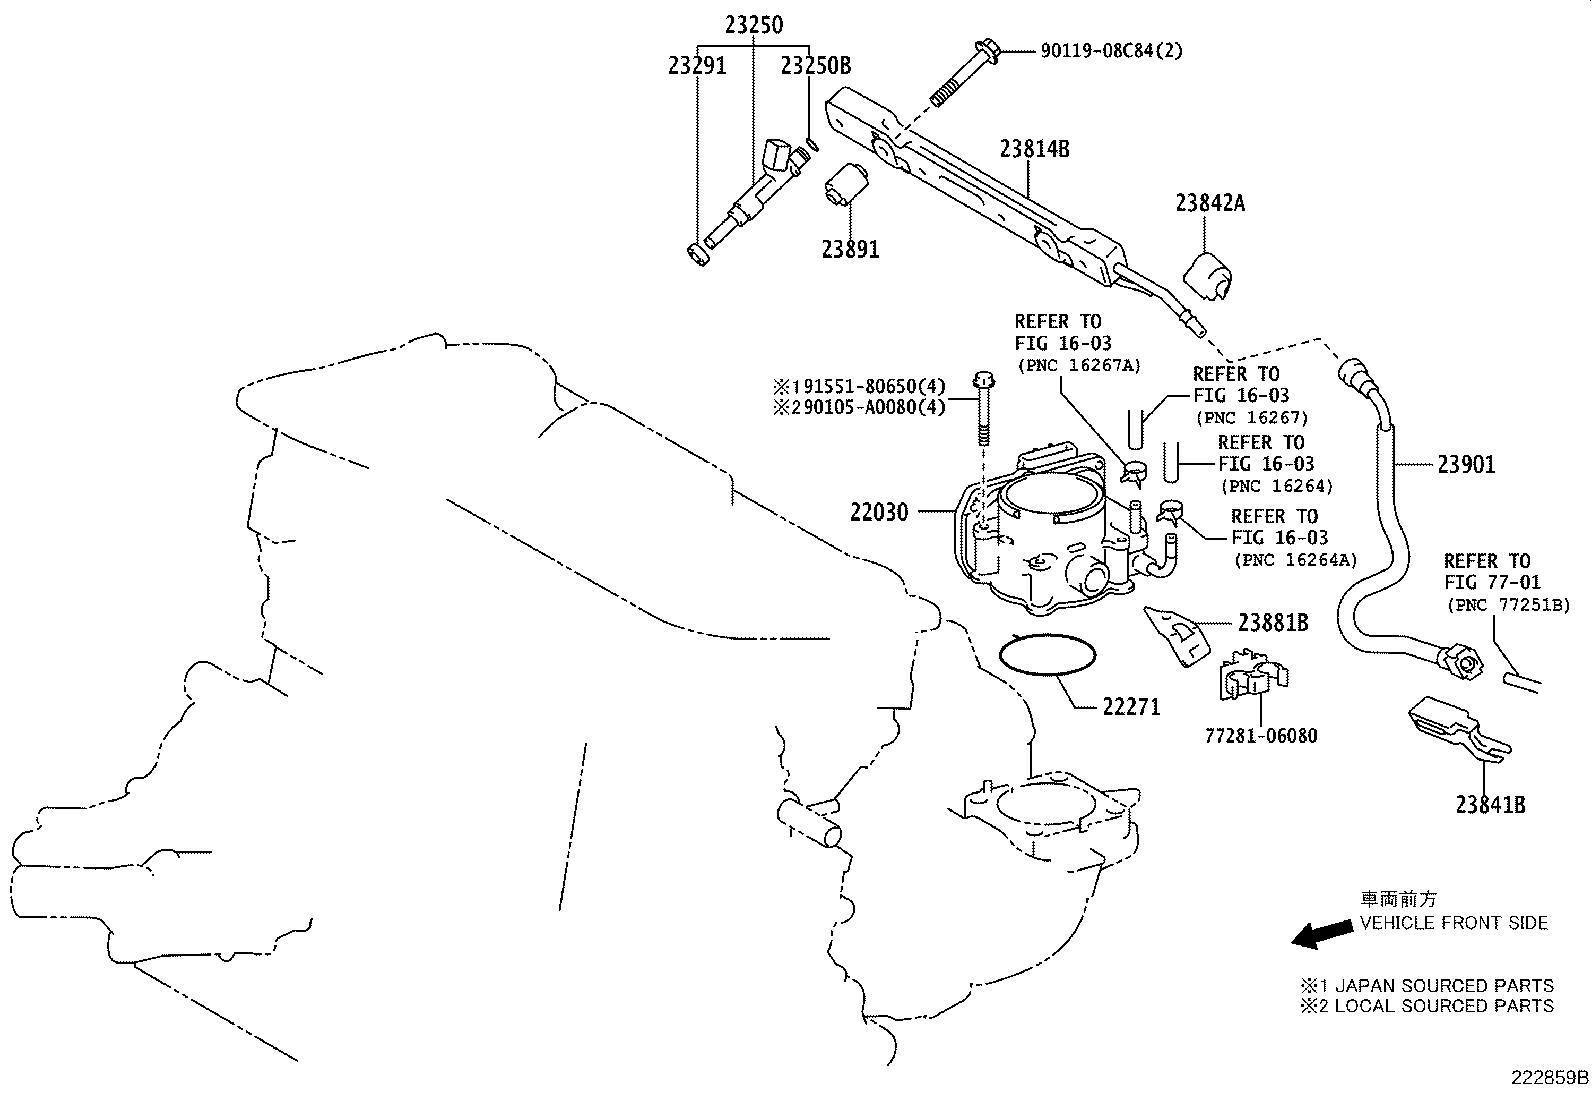 Toyota Avalon Clamp, fuel pipe, no. 1(for efi